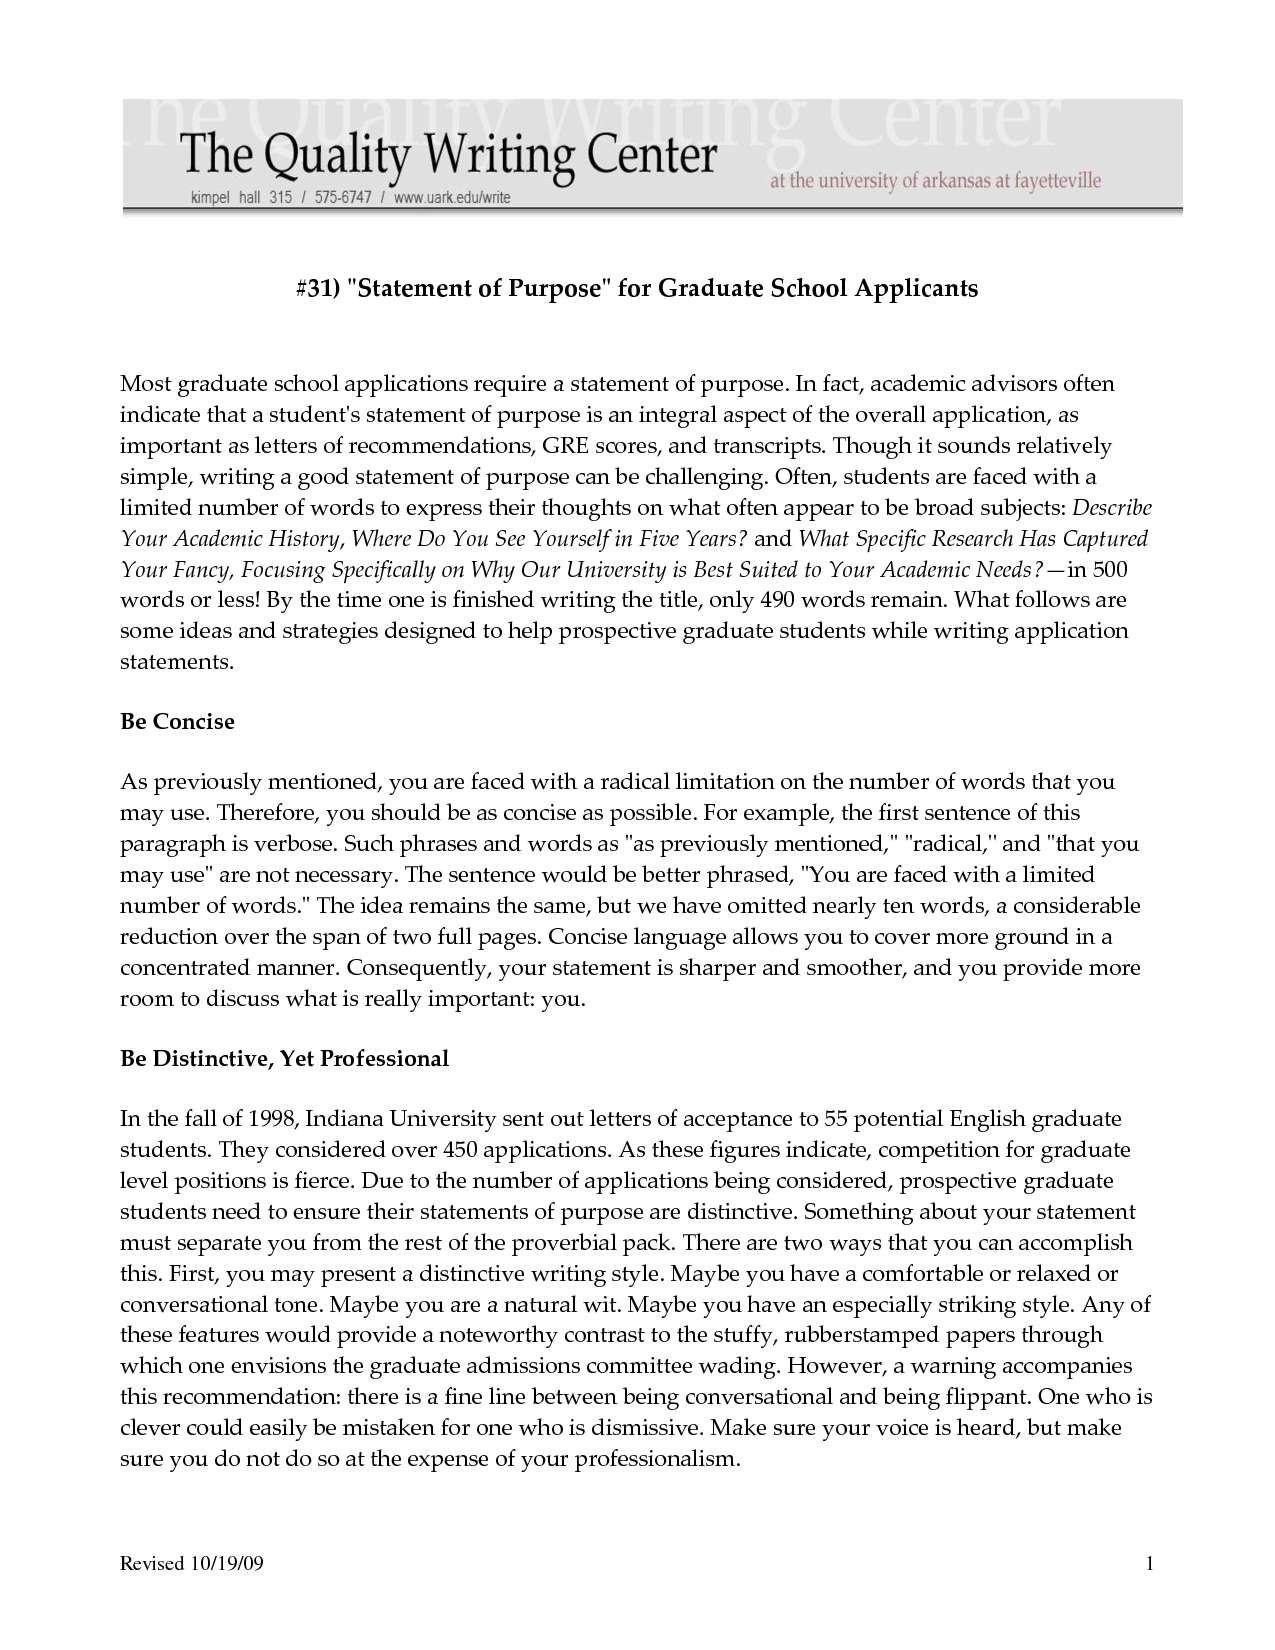 Sample Personal Statement for College  School essay, Graduate